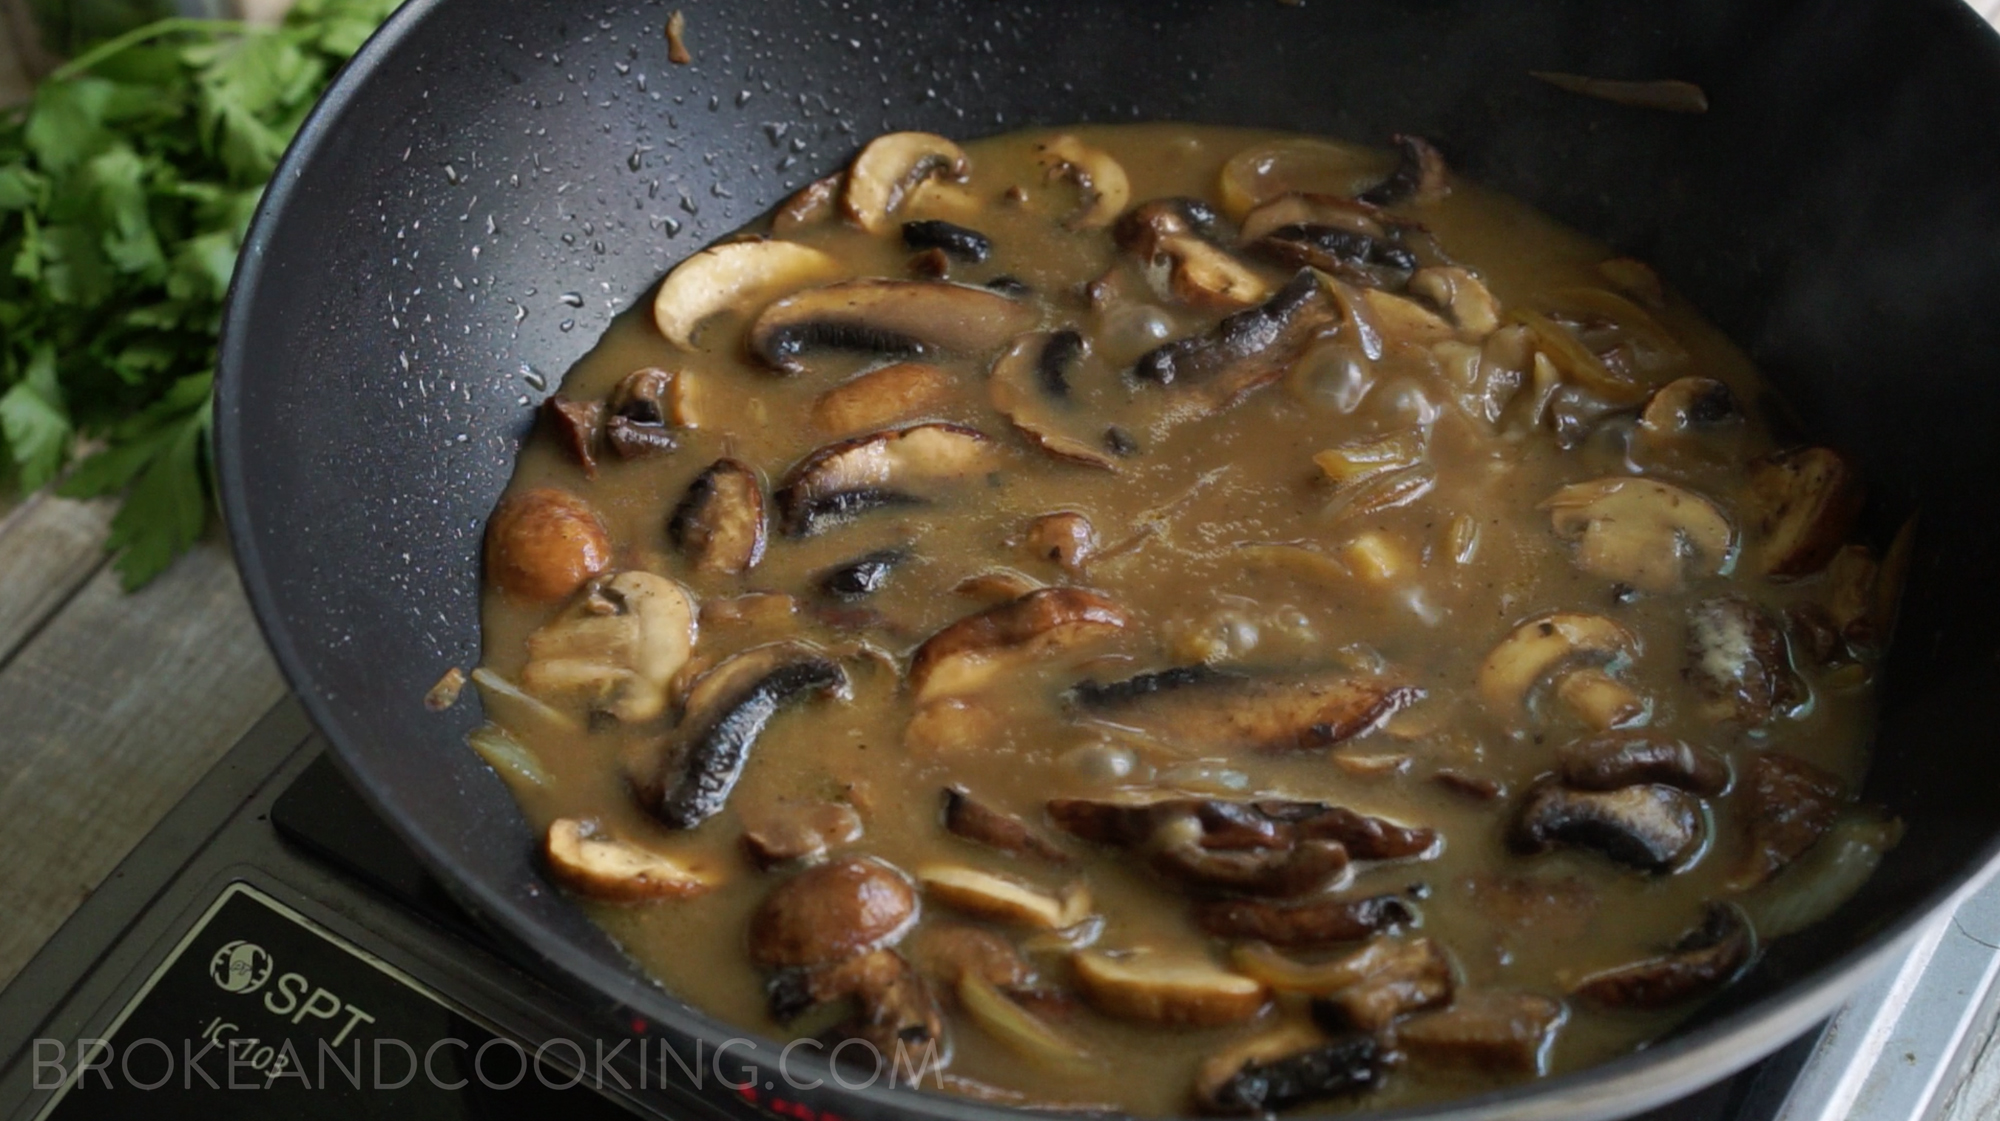 Skinny Beef Stroganoff Recipe by Broke and Cooking - www.brokeandcooking.com